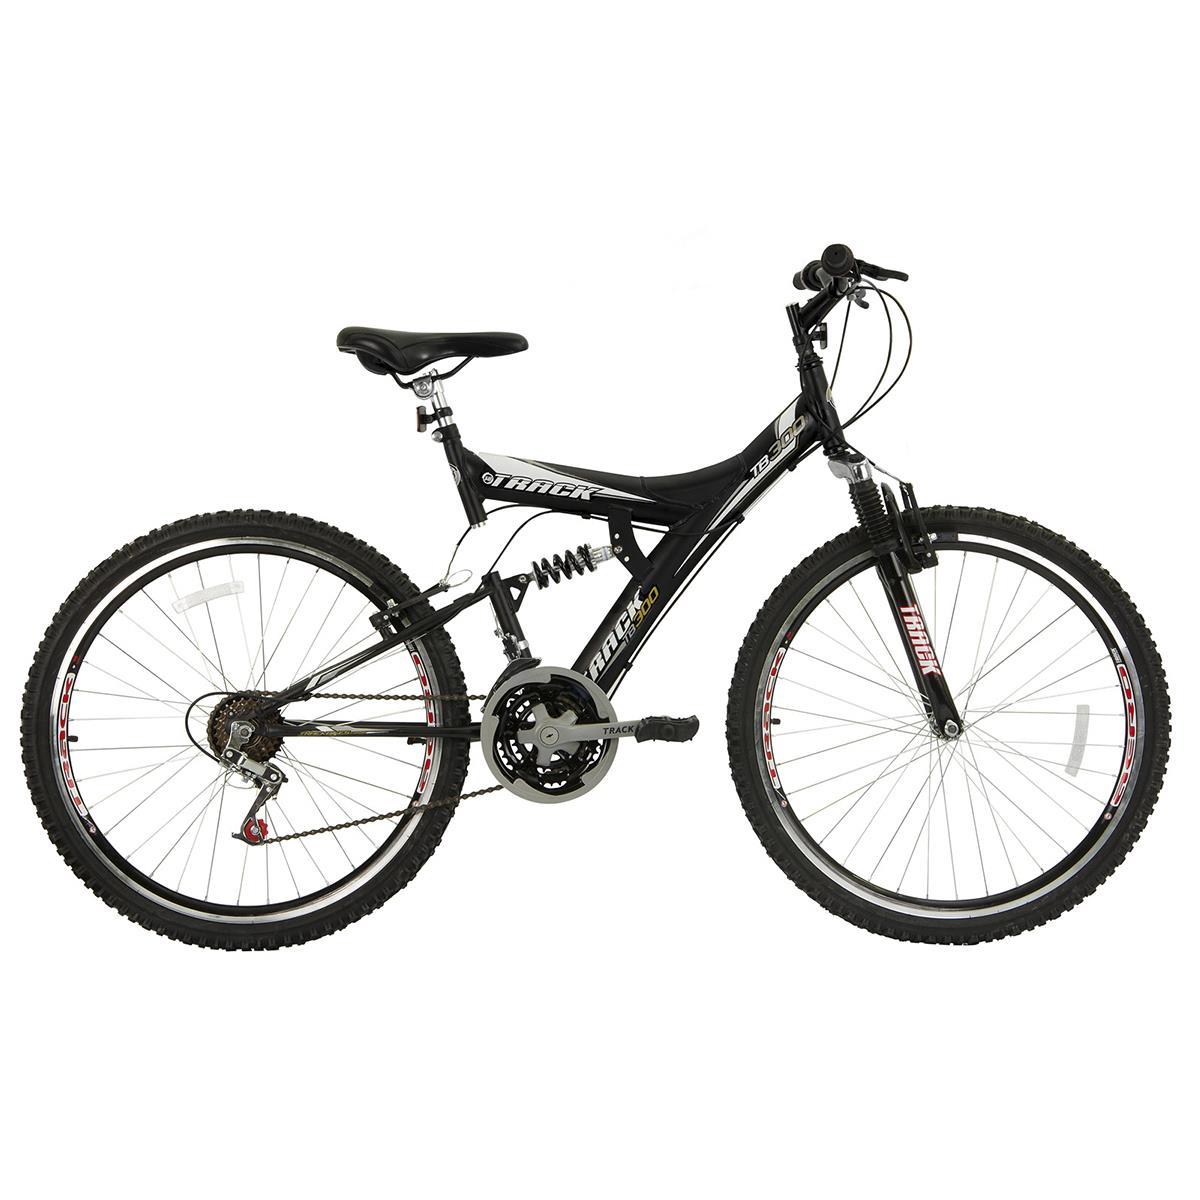 Bicicleta Track & Bikes Aro 26 TB 300XS Suspensão Dupla 18 Velocidades